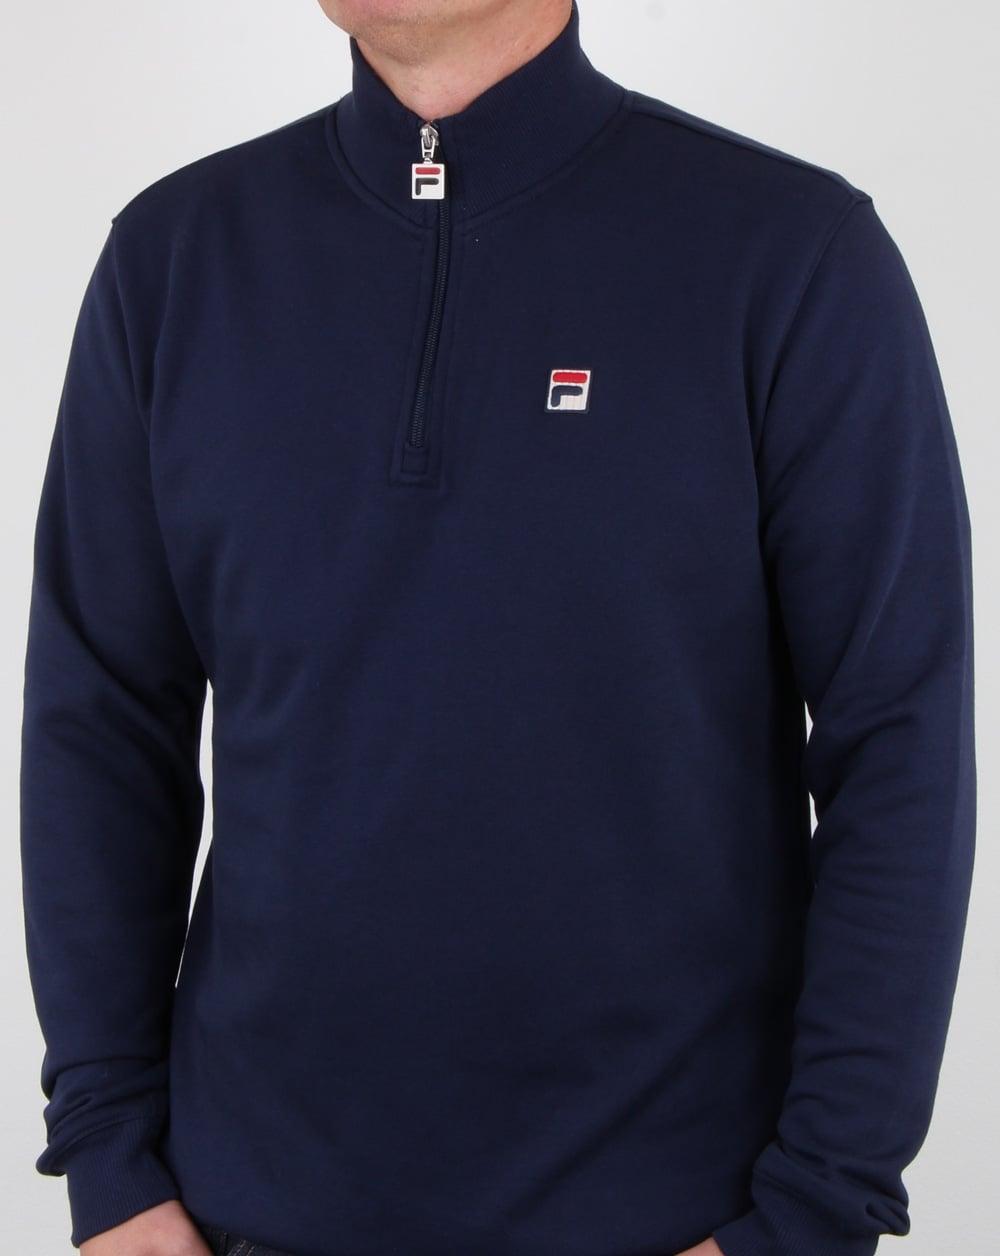 78a323dd370b Fila Vintage Palermo Zip Sweat Navy, Mens, Sweatshirt, Half Zip,Cotton